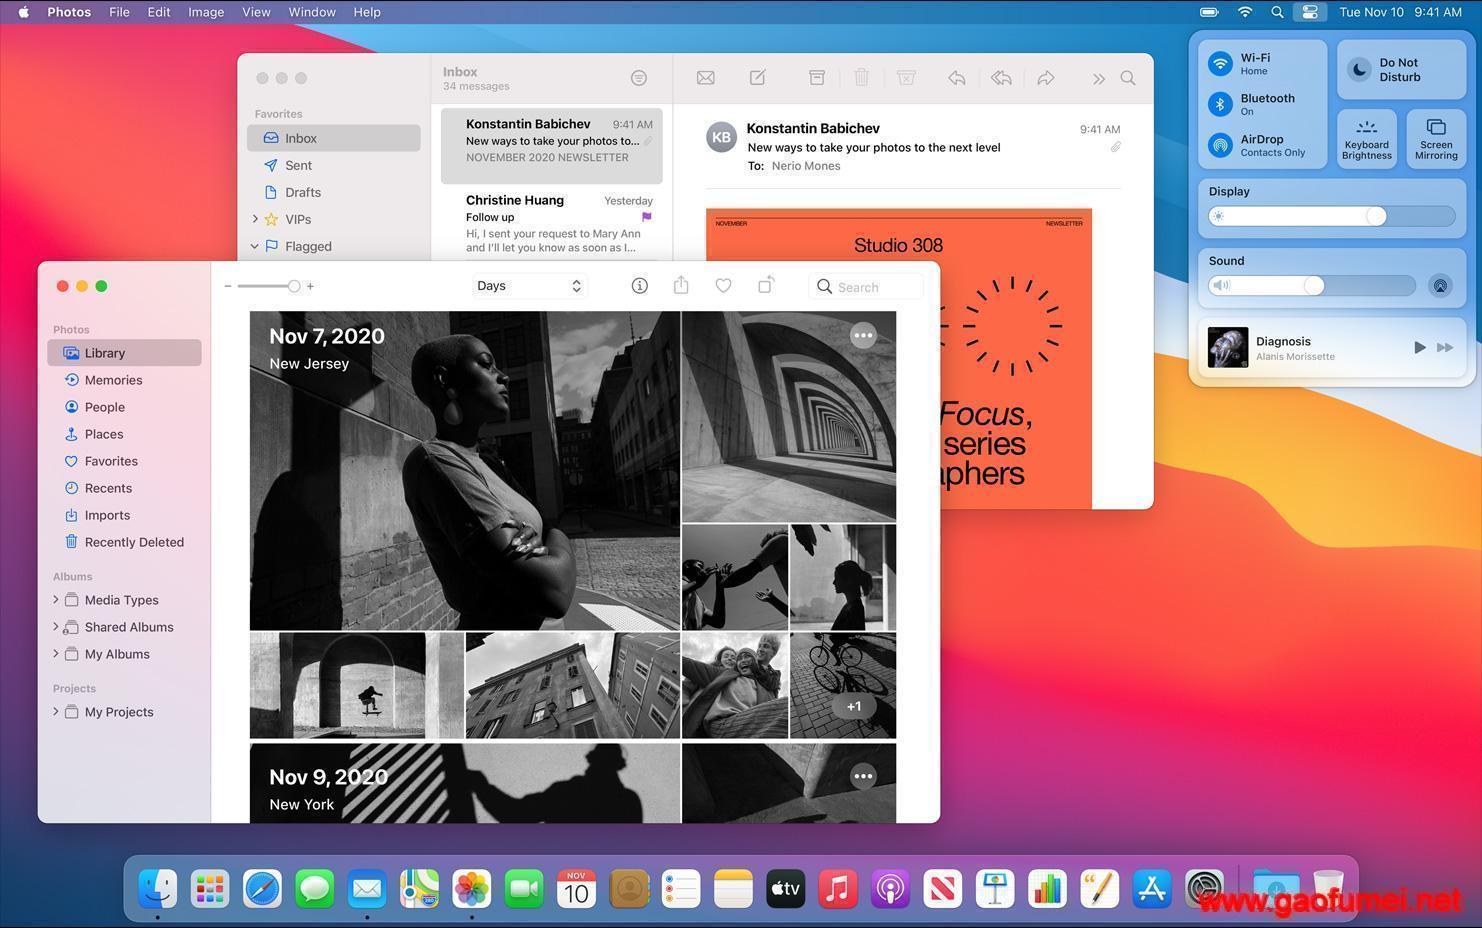 Mac OS Big Sur 11.0.1 (20B29) 正式版,黑苹果原版镜像免费下载和安装,自带Clover v5.0 r5126和OC引导 v0.6.3 黑苹果系统(破解版) 第2张-泥人传说